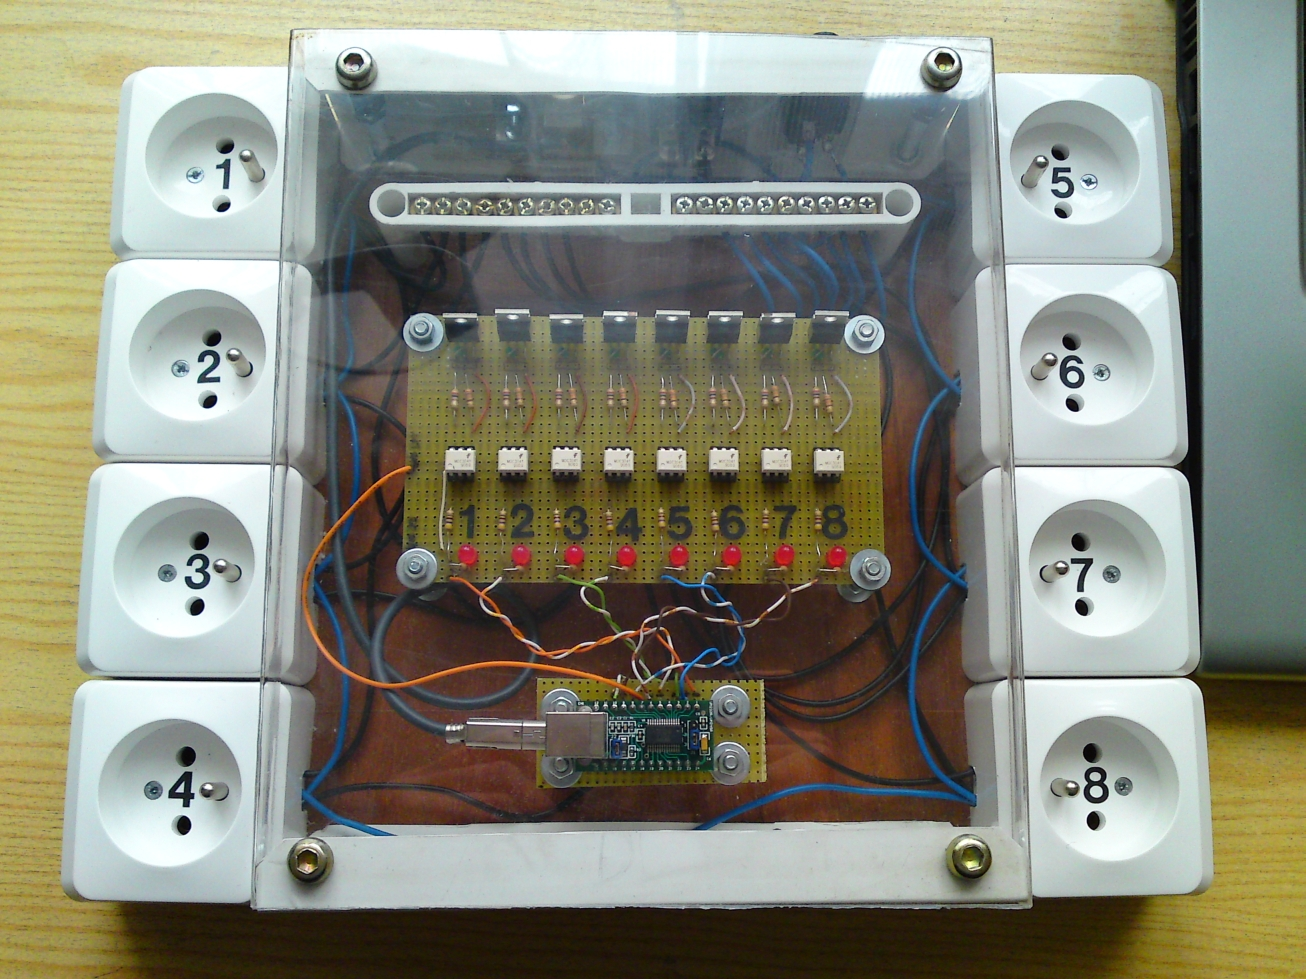 Sterownik Discolitez/Lightning, 8 kana��w + USB FT245RL